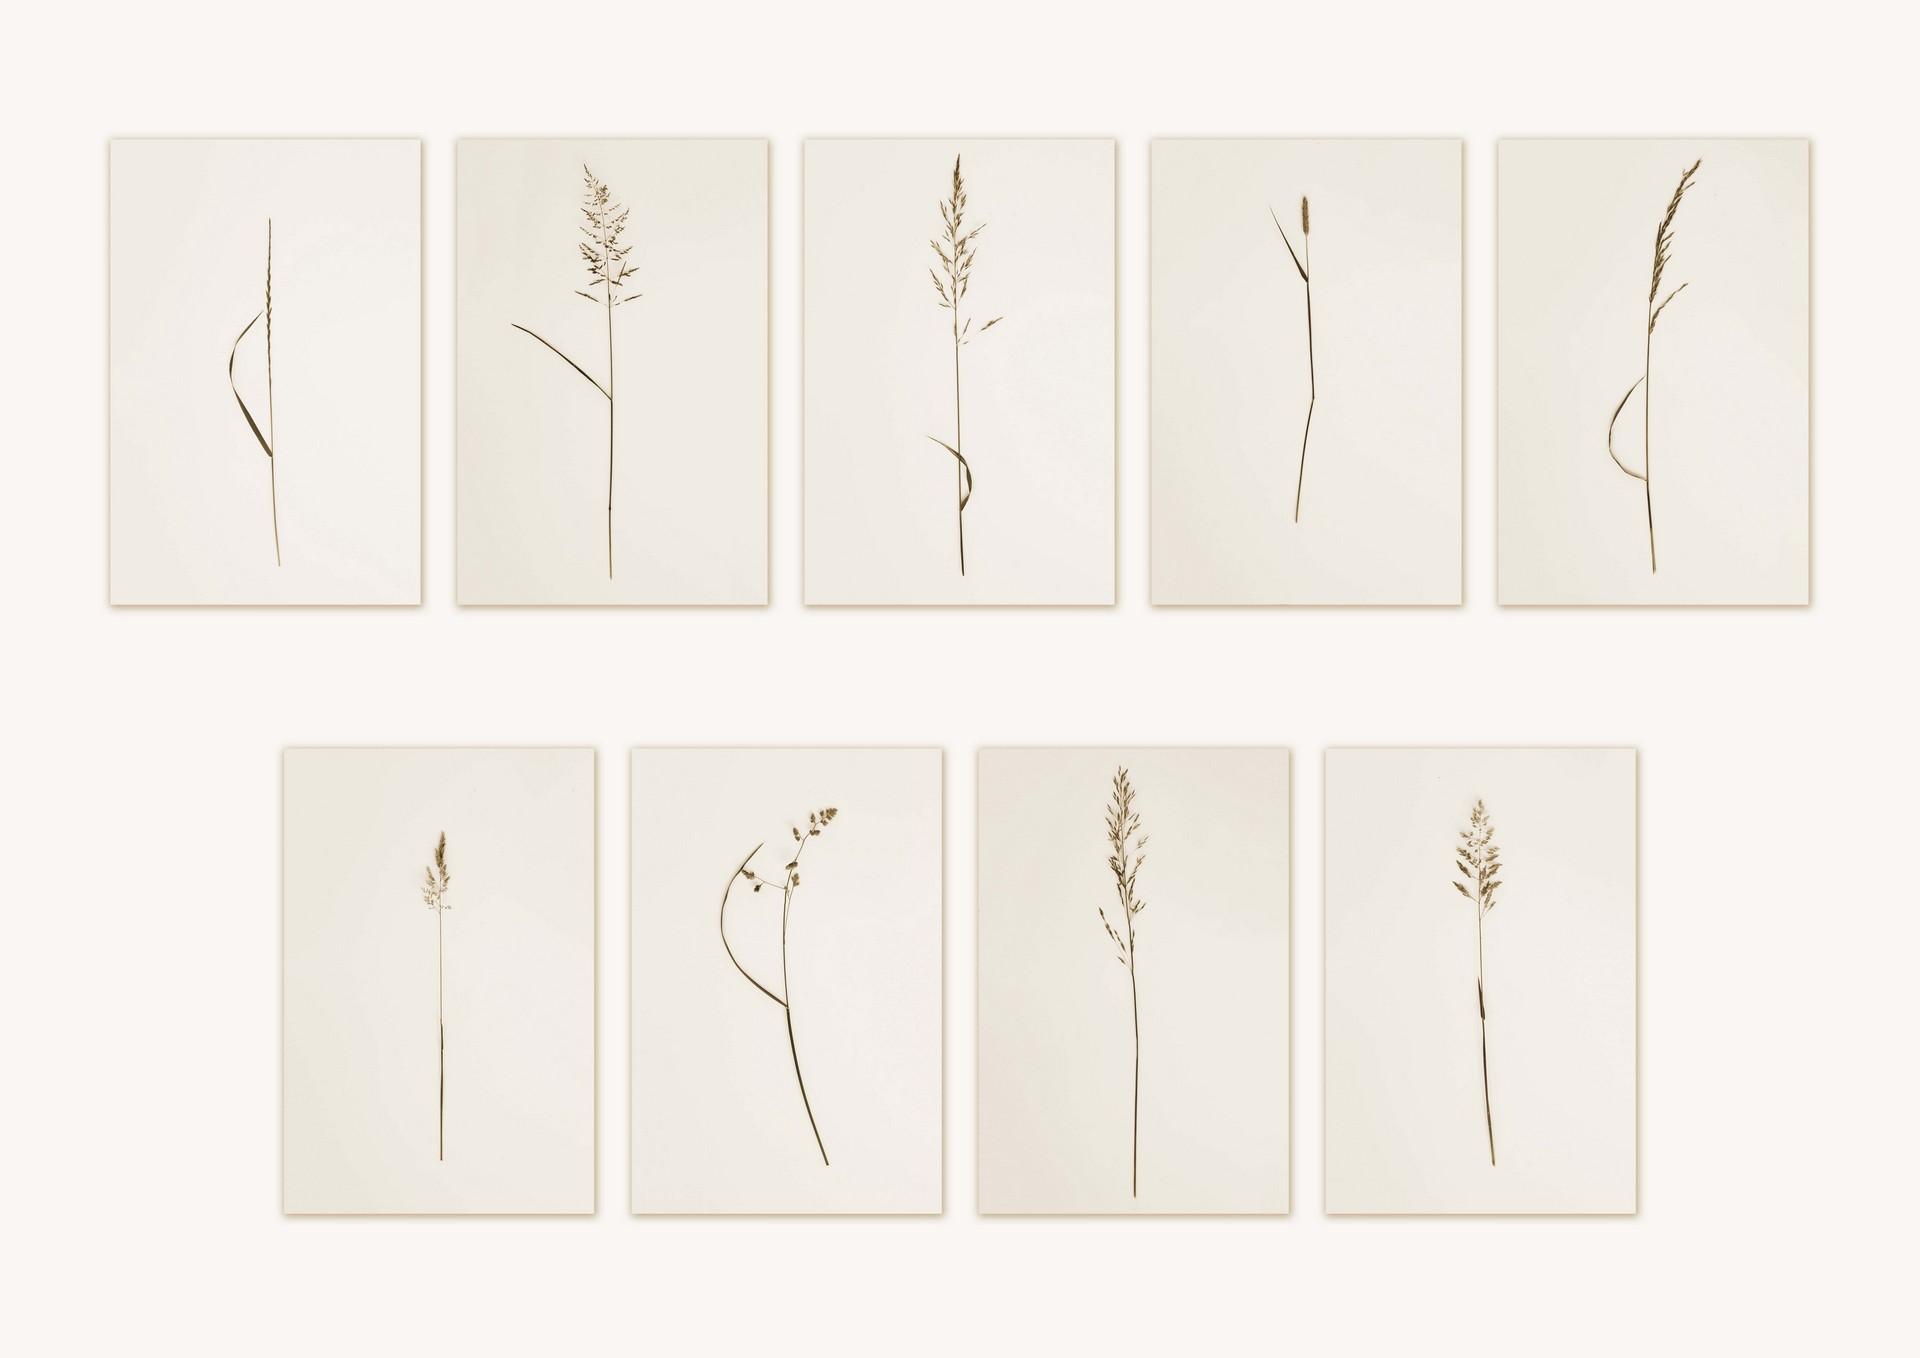 Fashionistic Grasses